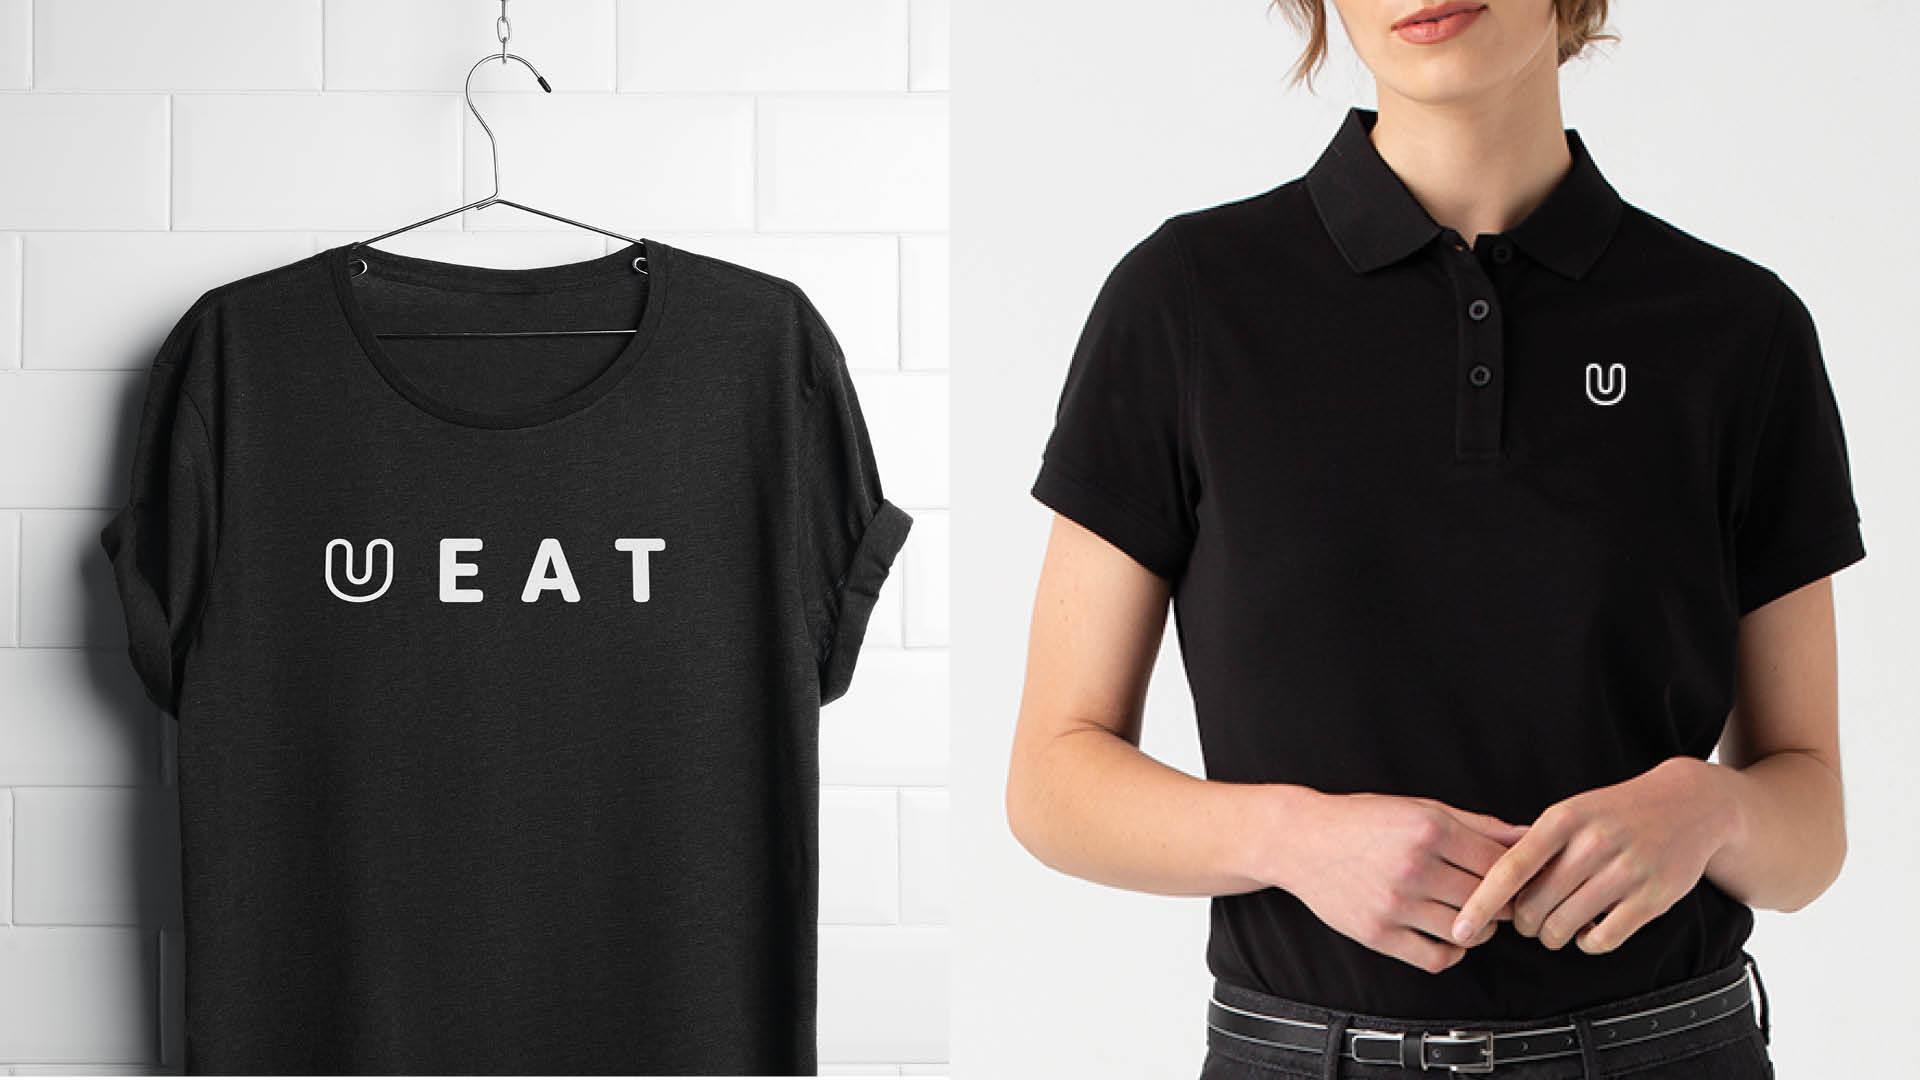 Turbulences-realisation_UEAT-branding-tshirt